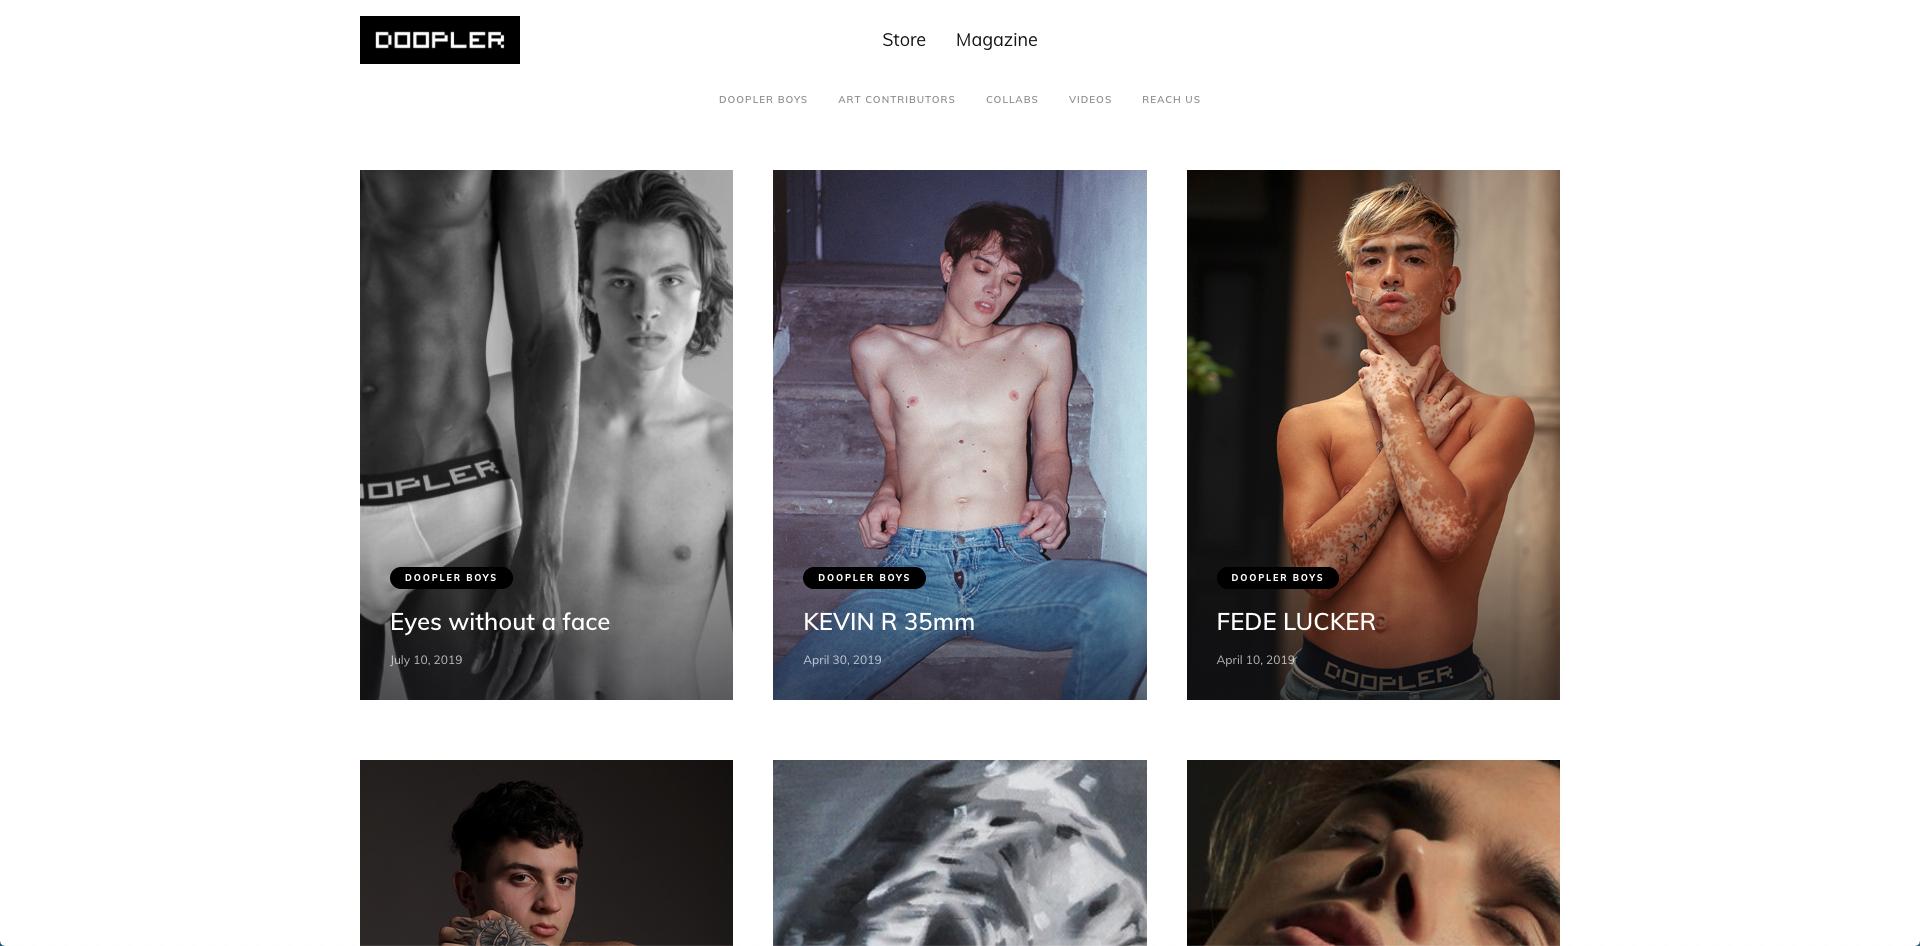 doopler-mag-dooplermag-magazine-studio-argentina-online-lab-lisbon-web-development-web-design-1